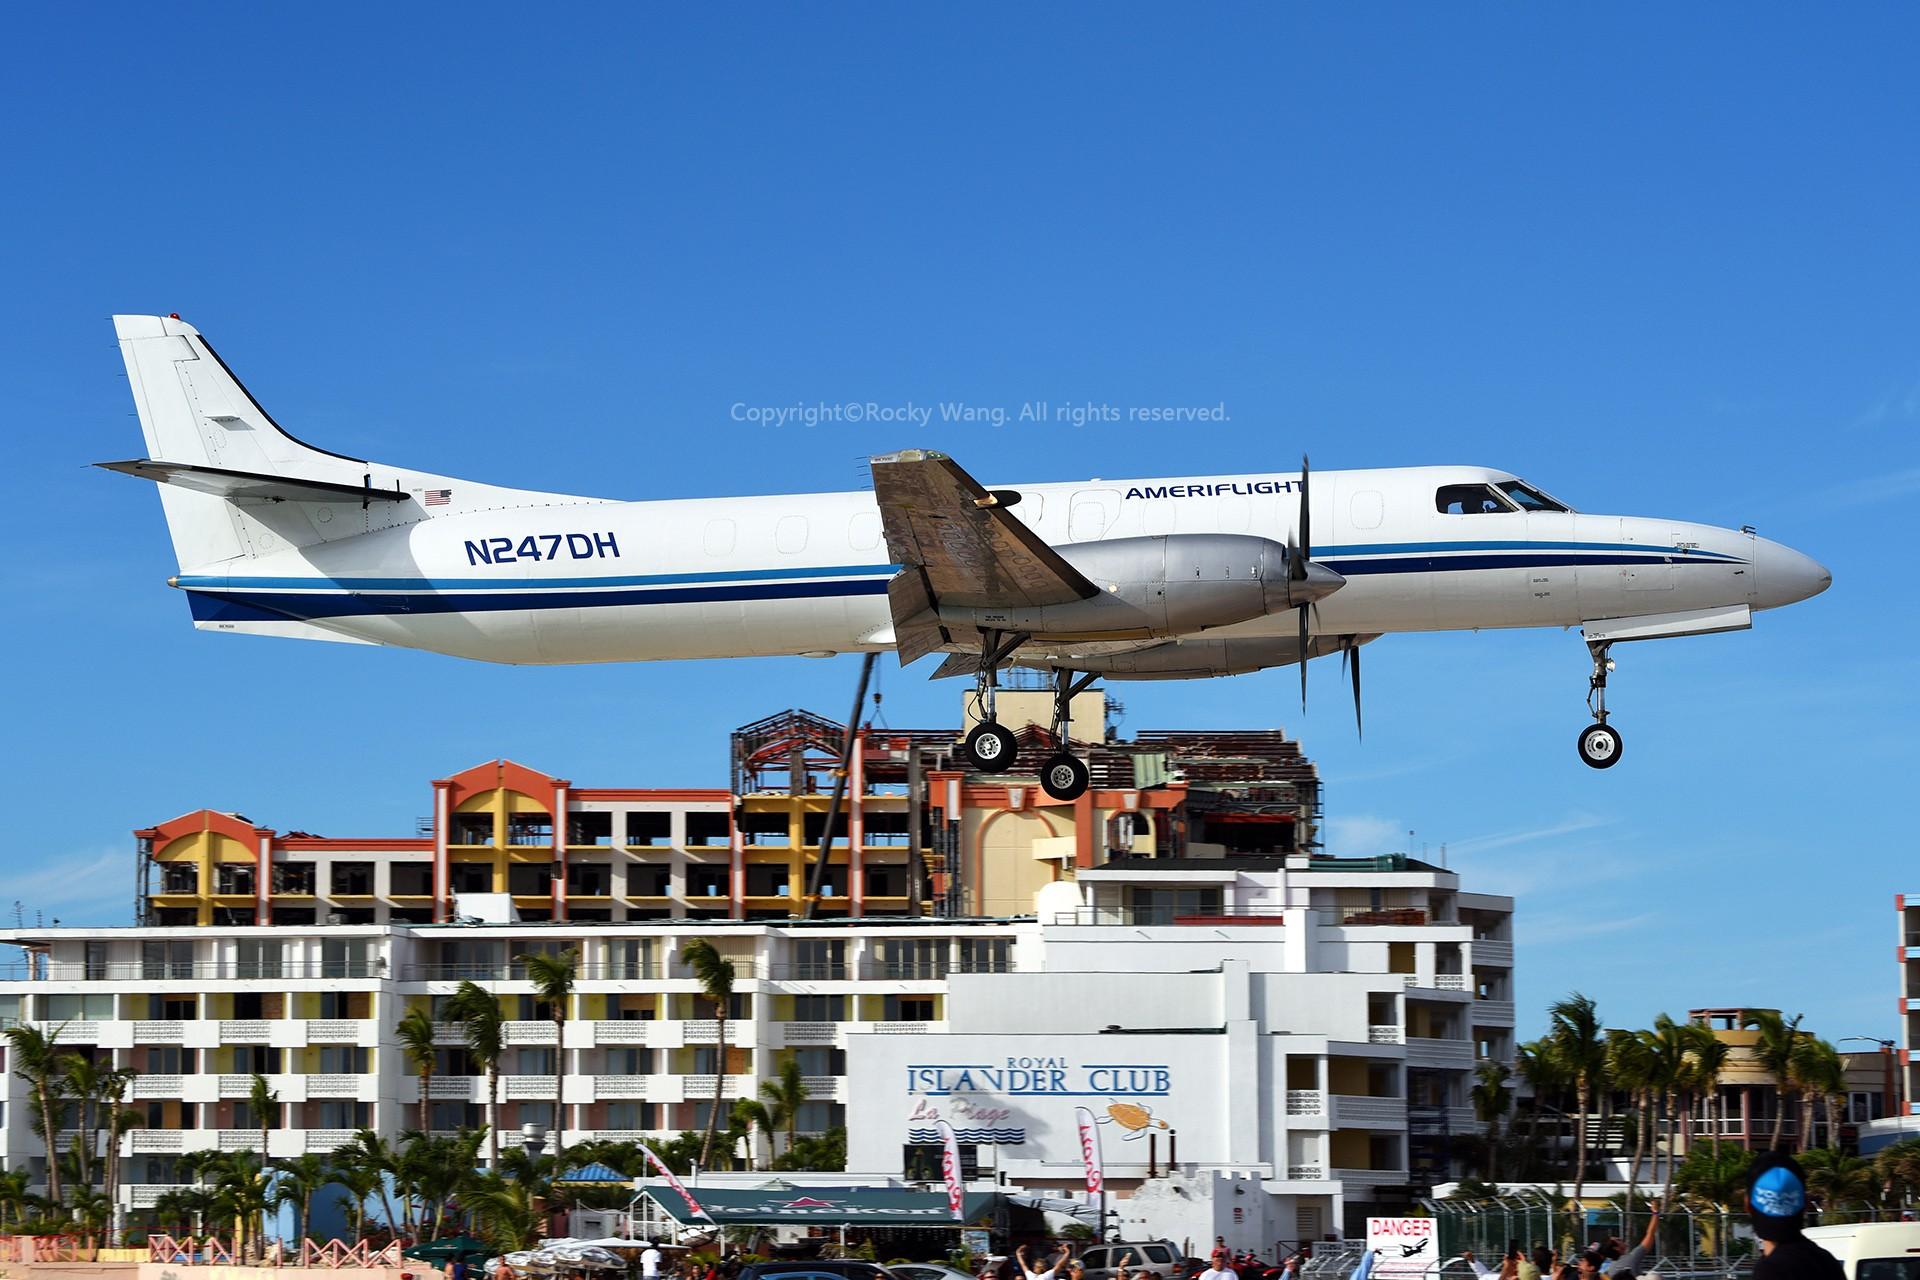 Re:[原创]My endless Caribbean dream——圣马丁朱莉安娜公主机场拍机记 FAIRCHILD SA227-AT EXPEDITER N247DH 荷属安的列斯群岛朱利安娜公主机场